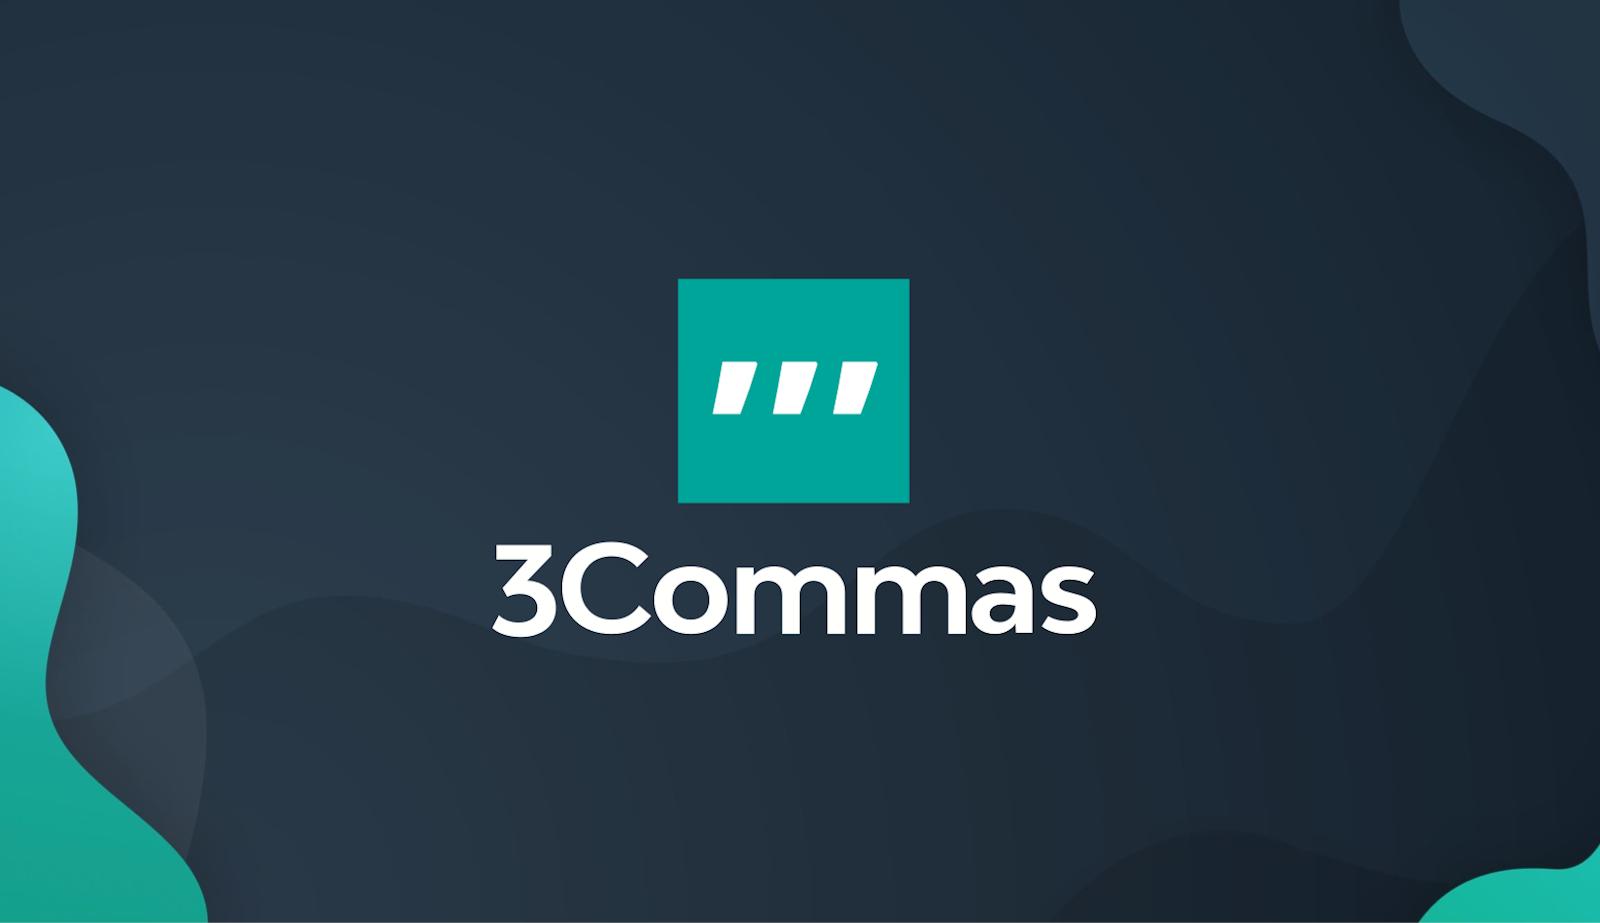 3 Commas